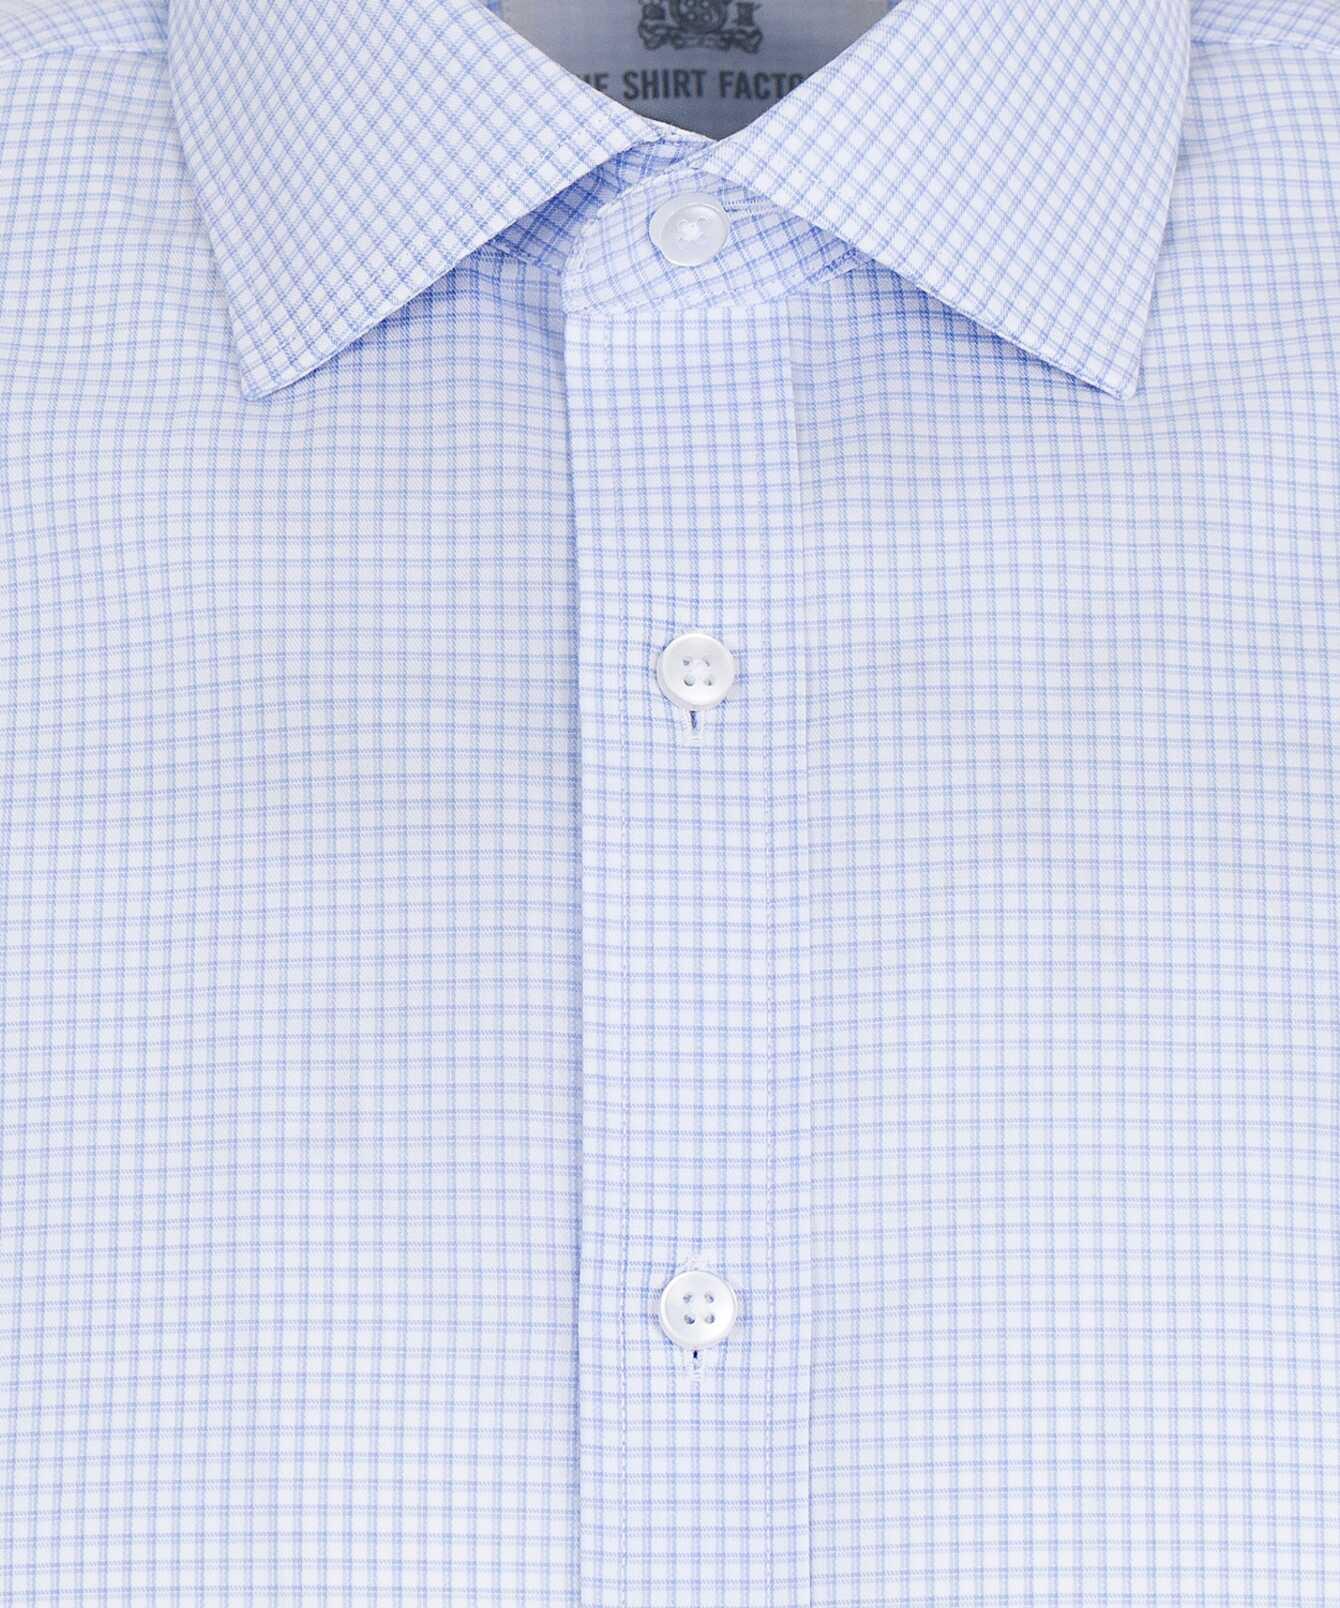 Skjorta Novato The Shirt Factory